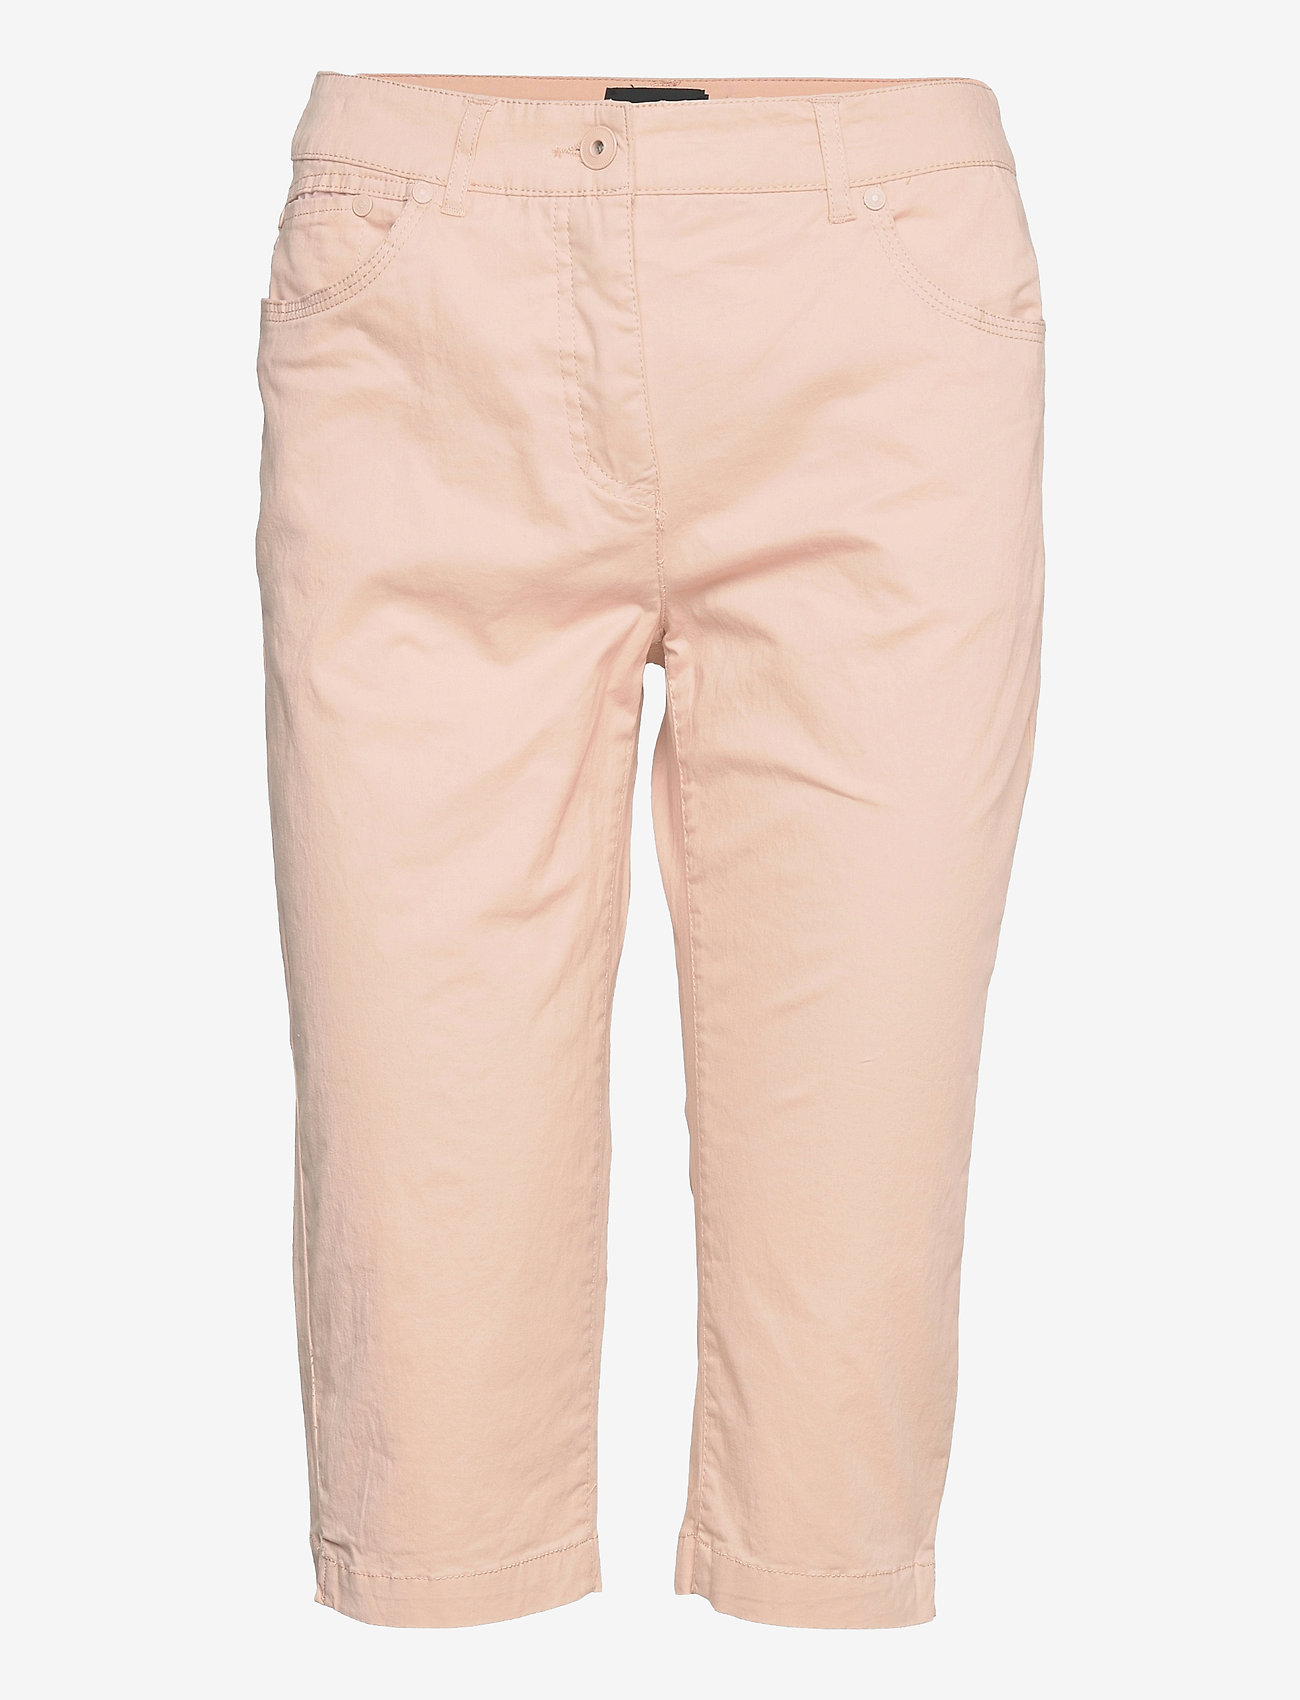 Brandtex - Capri pants - capri bukser - pale blush - 1